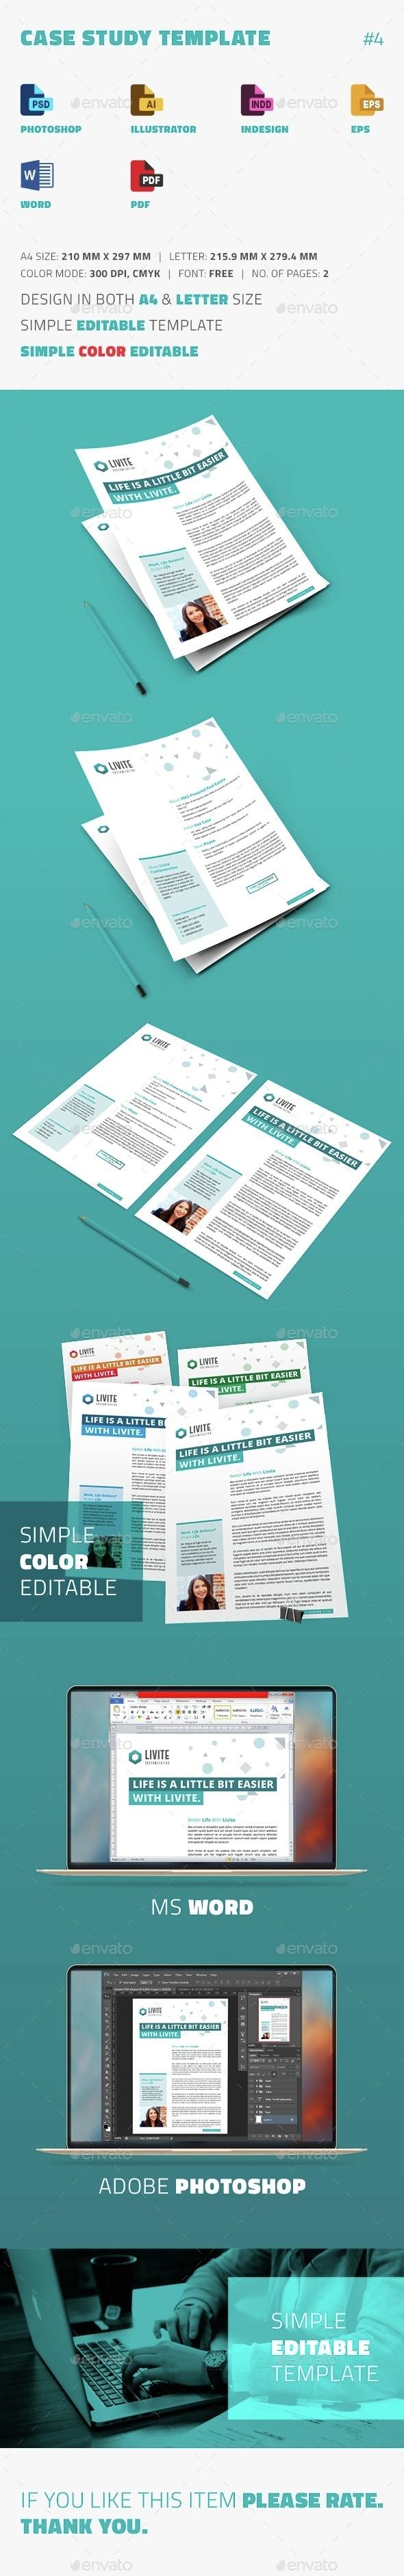 best Case study design ideas on Pinterest   Case study  Case     Harvard Business Review